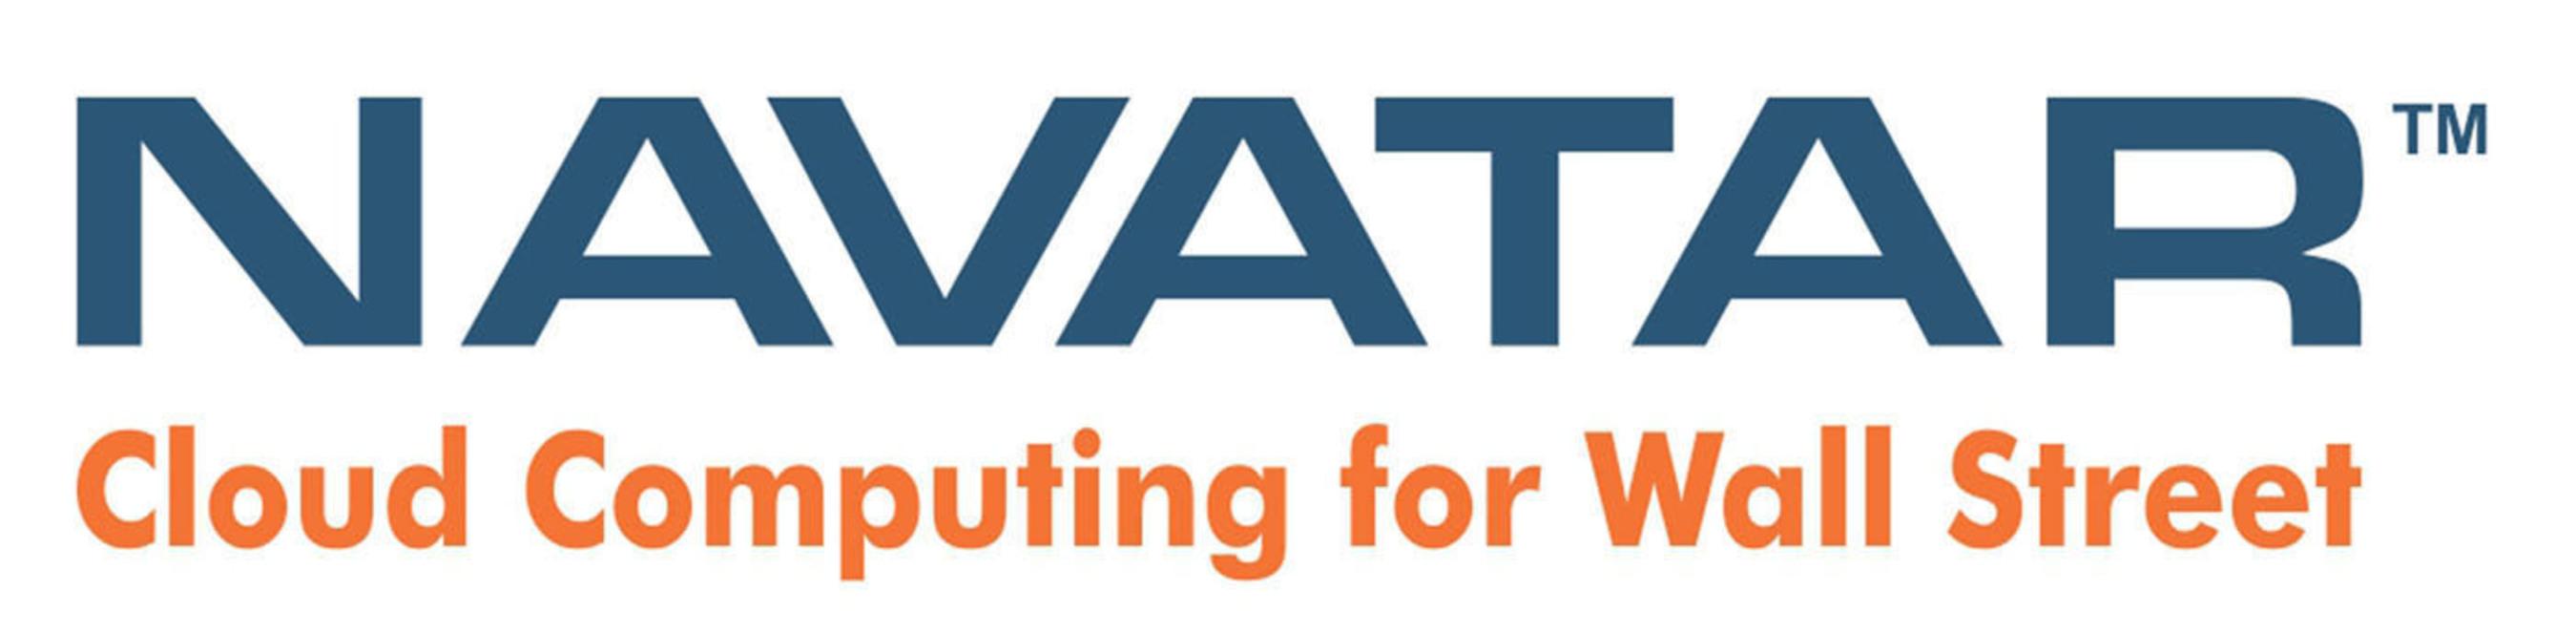 Navatar - Cloud Computing for Financial Services. Salesforce for Financial Services. Financial Services CRM. (PRNewsFoto/Navatar Group)